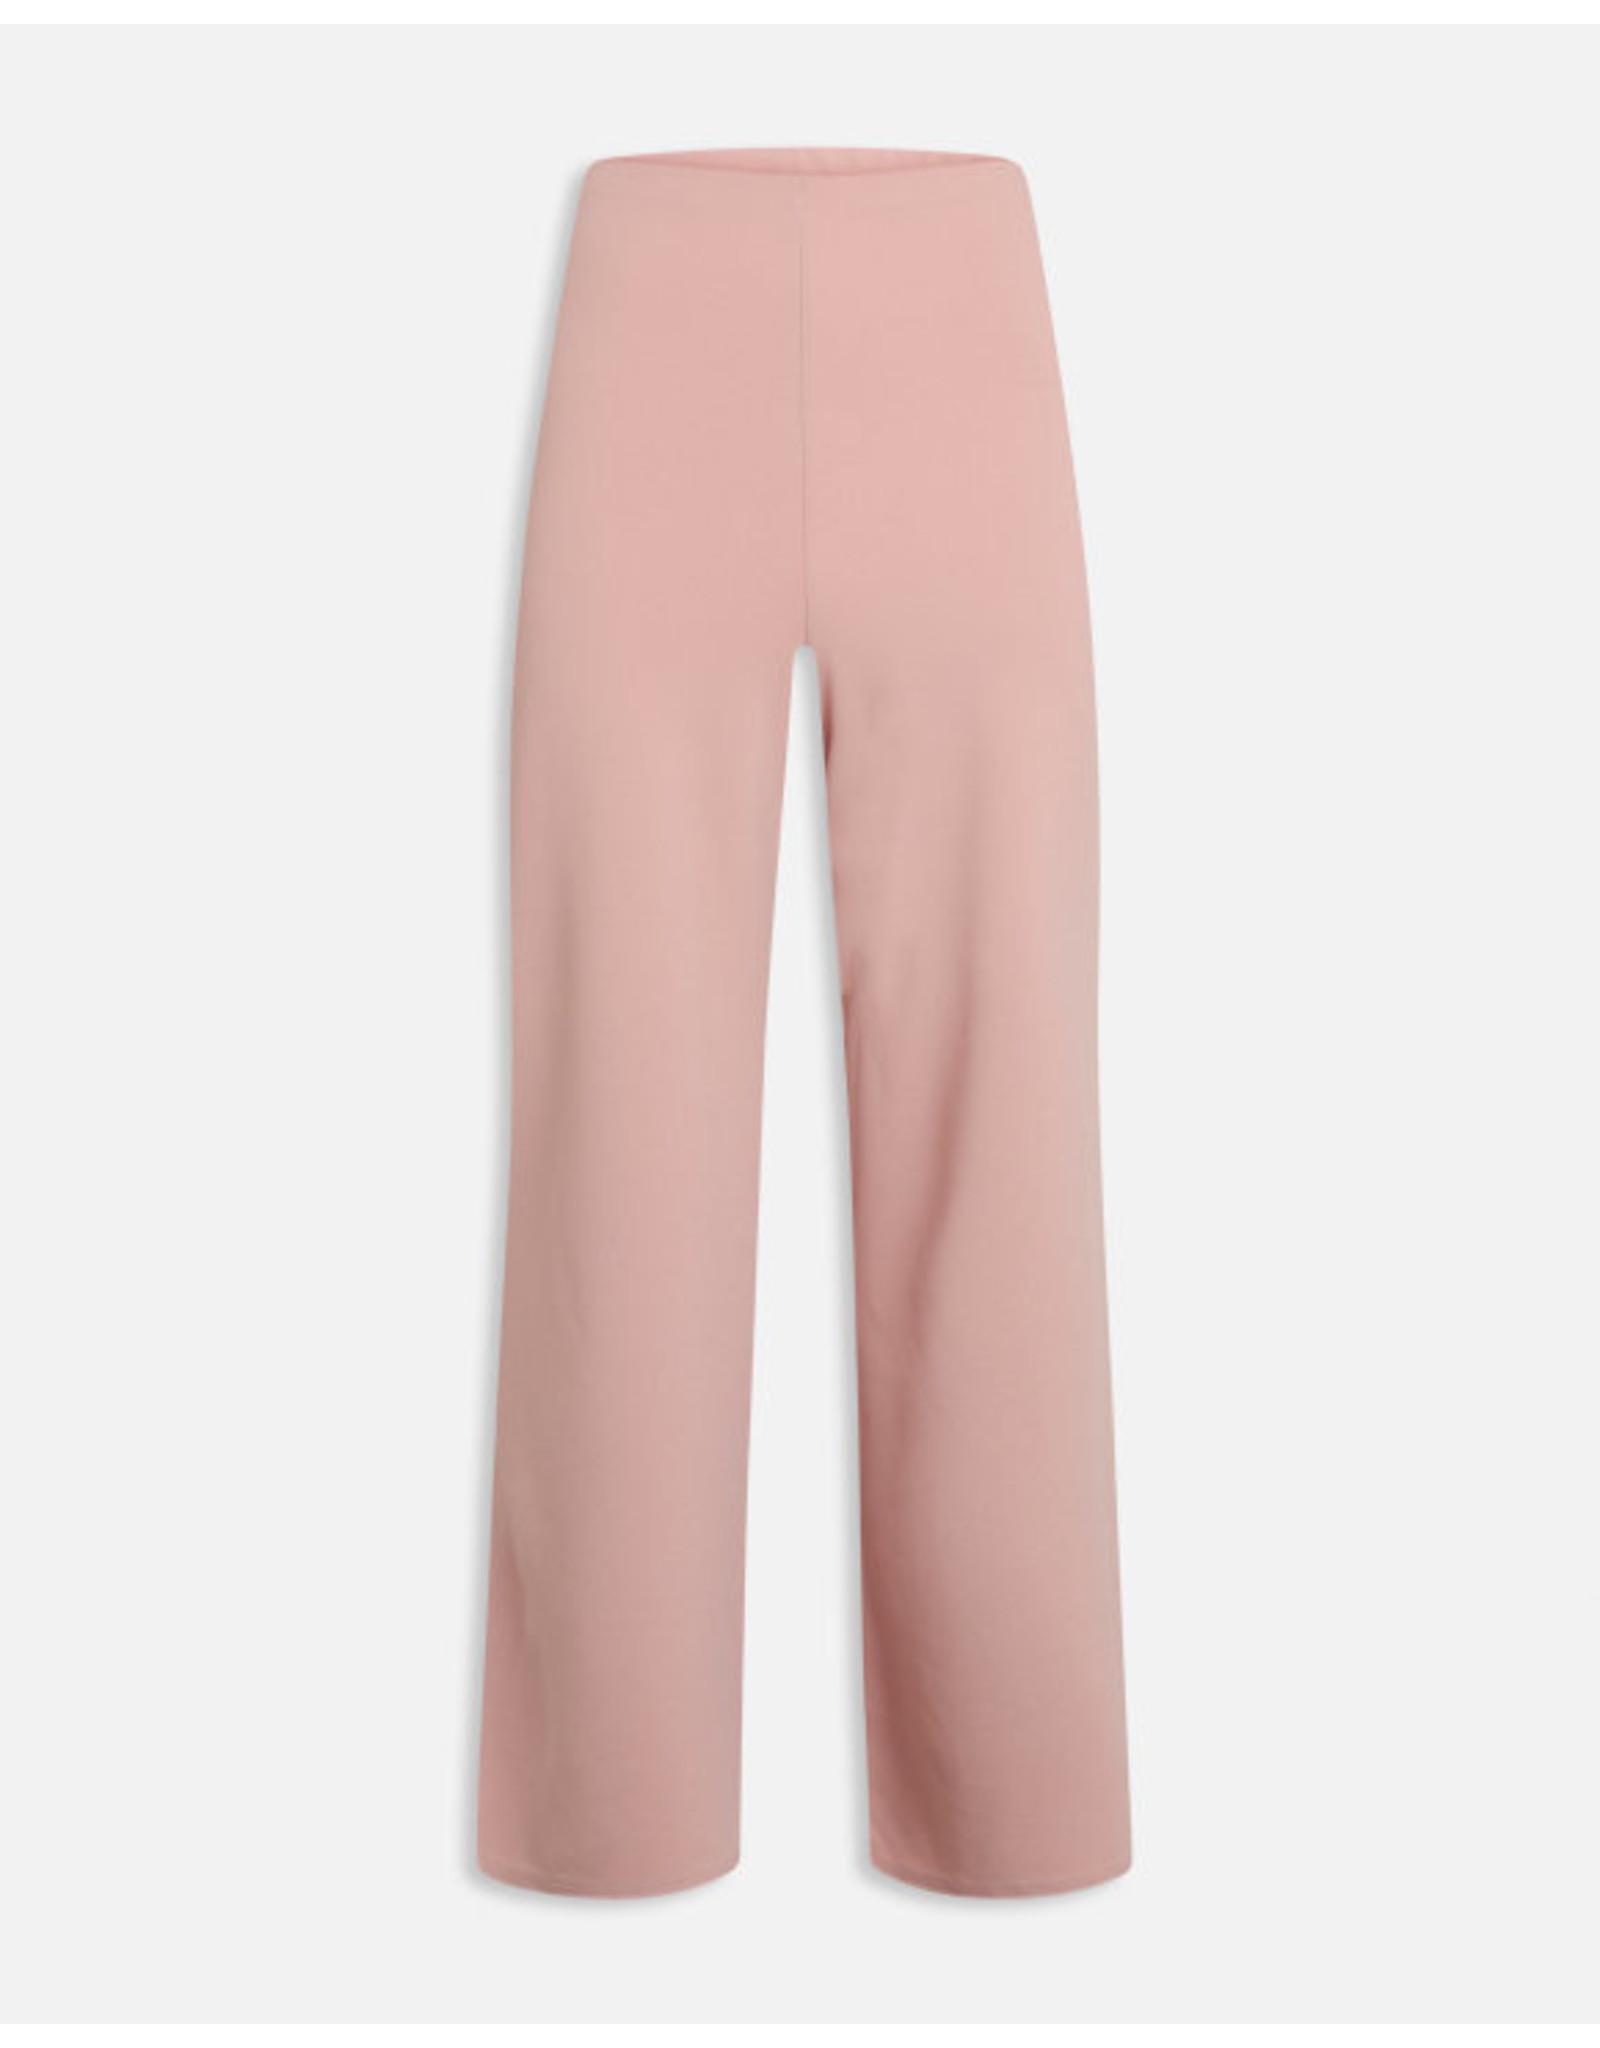 GLUT PANTS ROSE